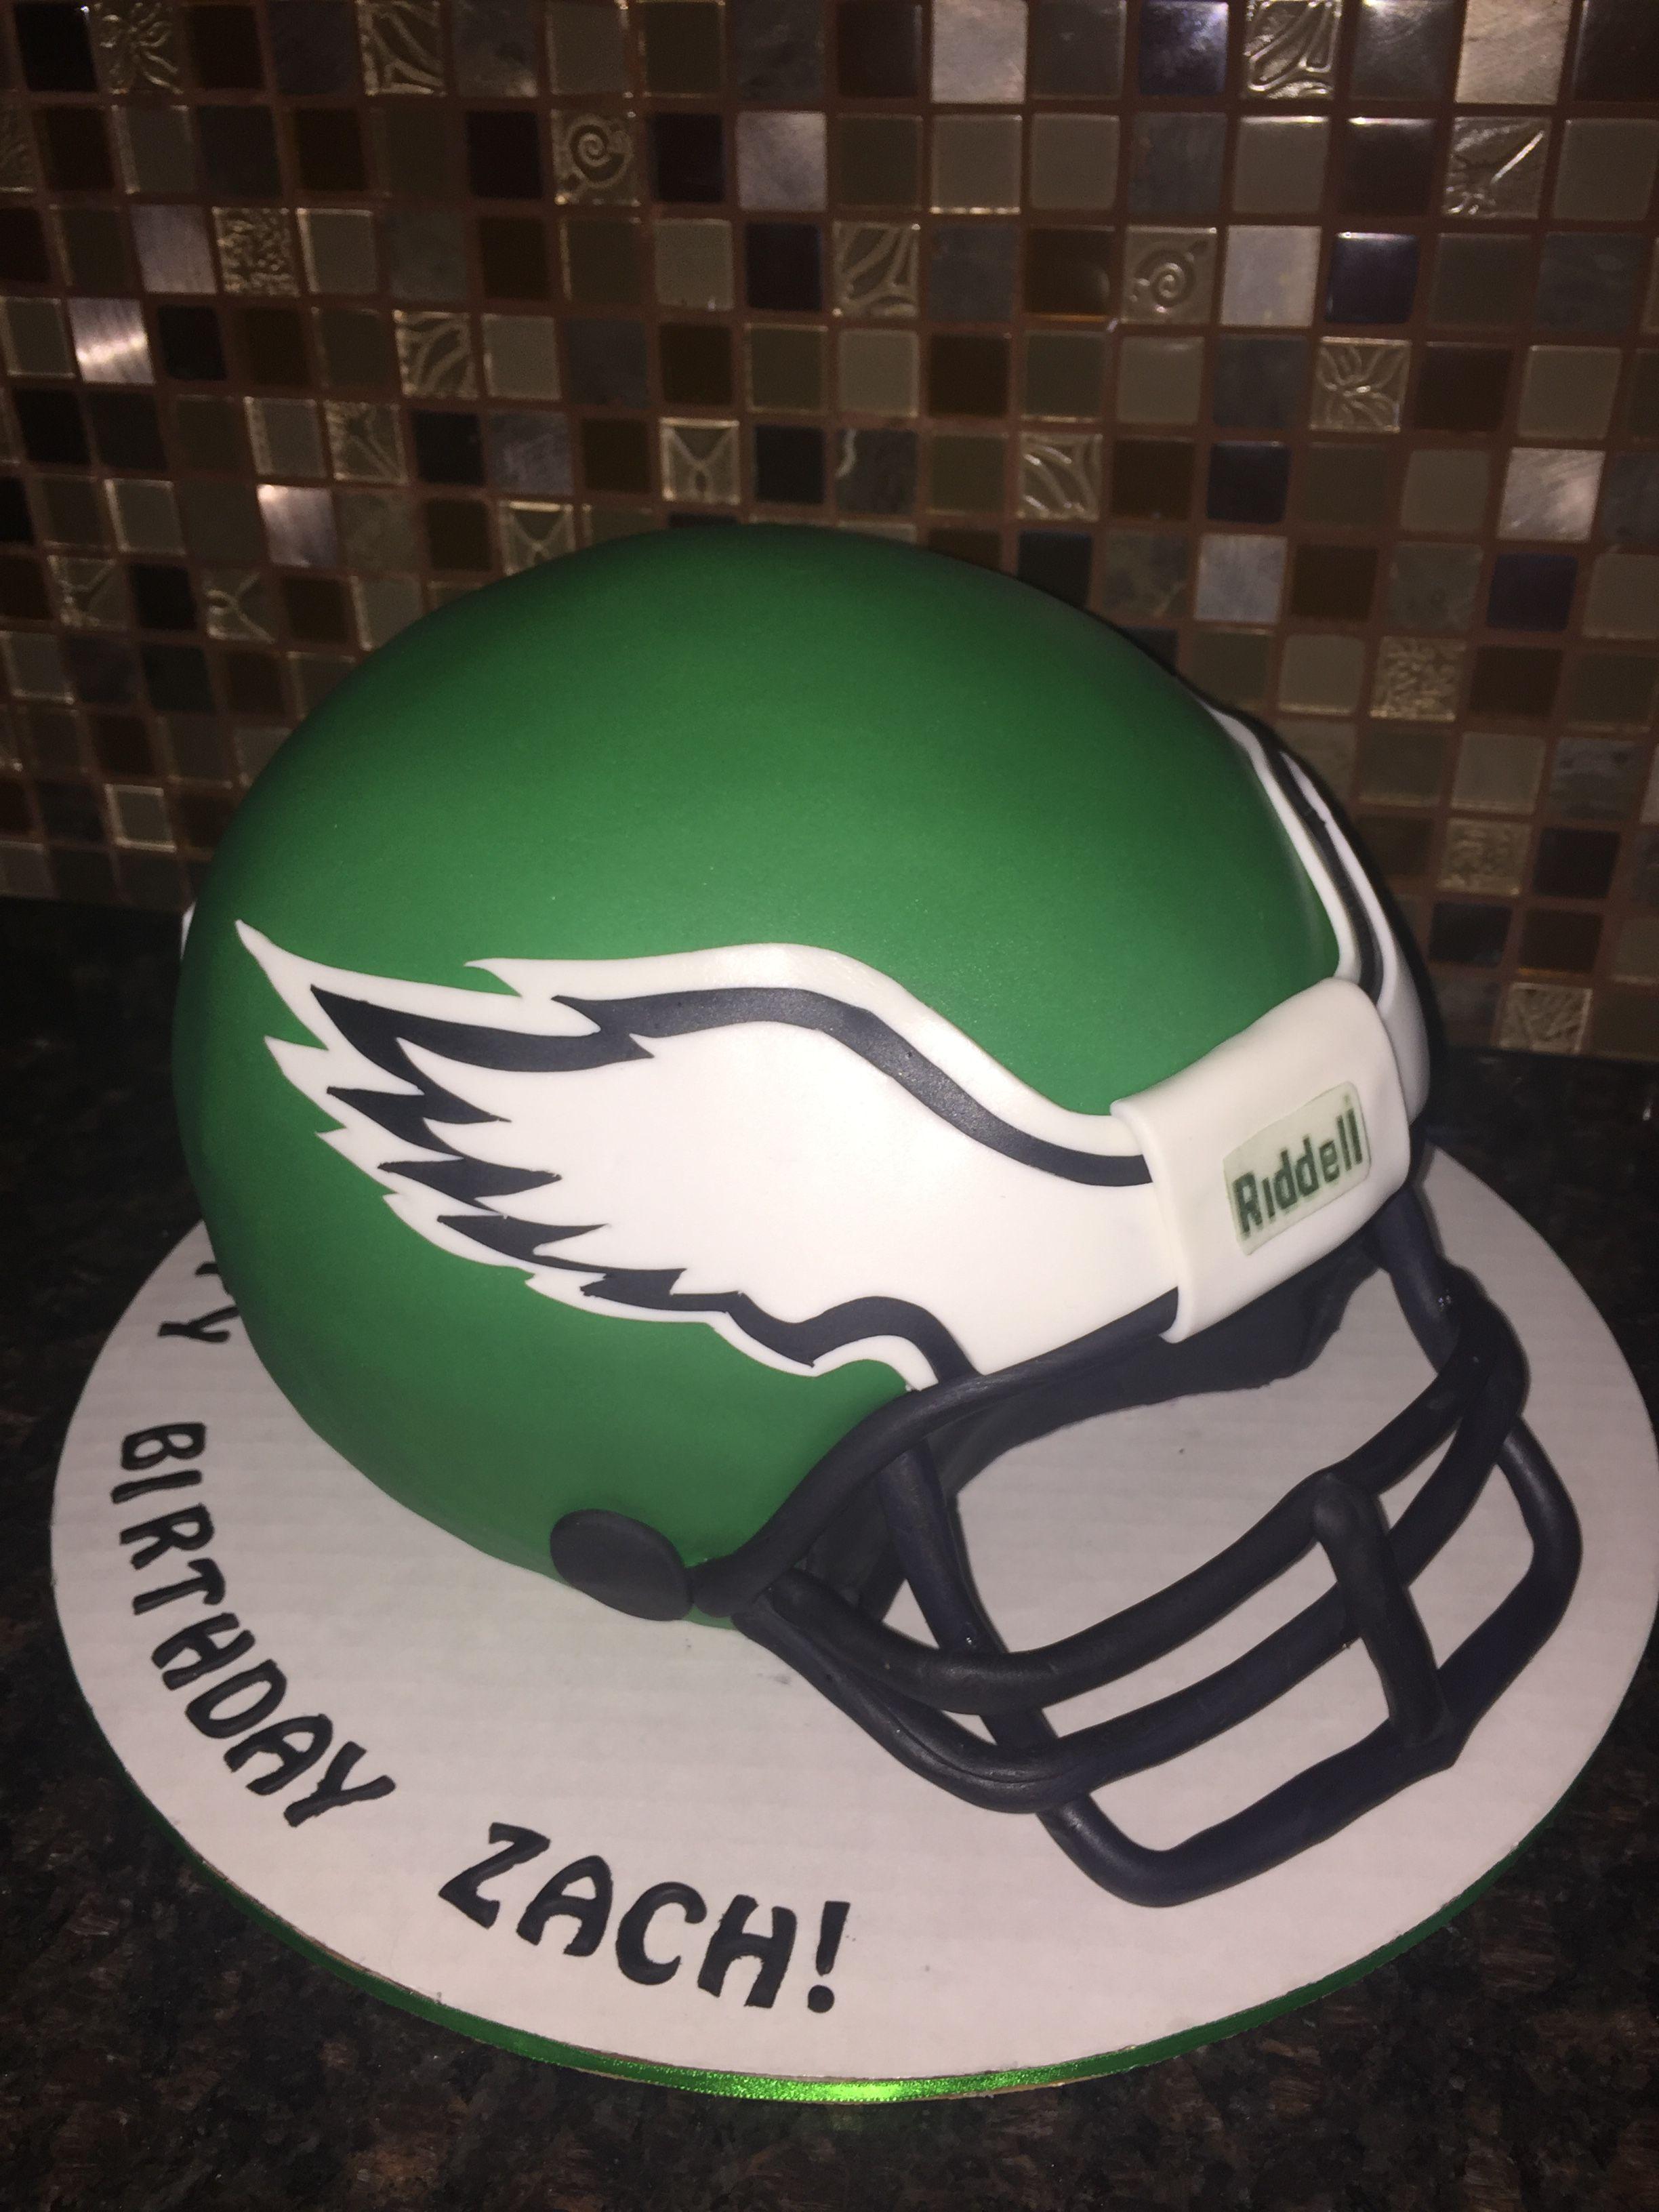 Philadelphia Eagles Helmet Philadelphia Eagles Helmet Eagles Helmet Philadelphia Eagles